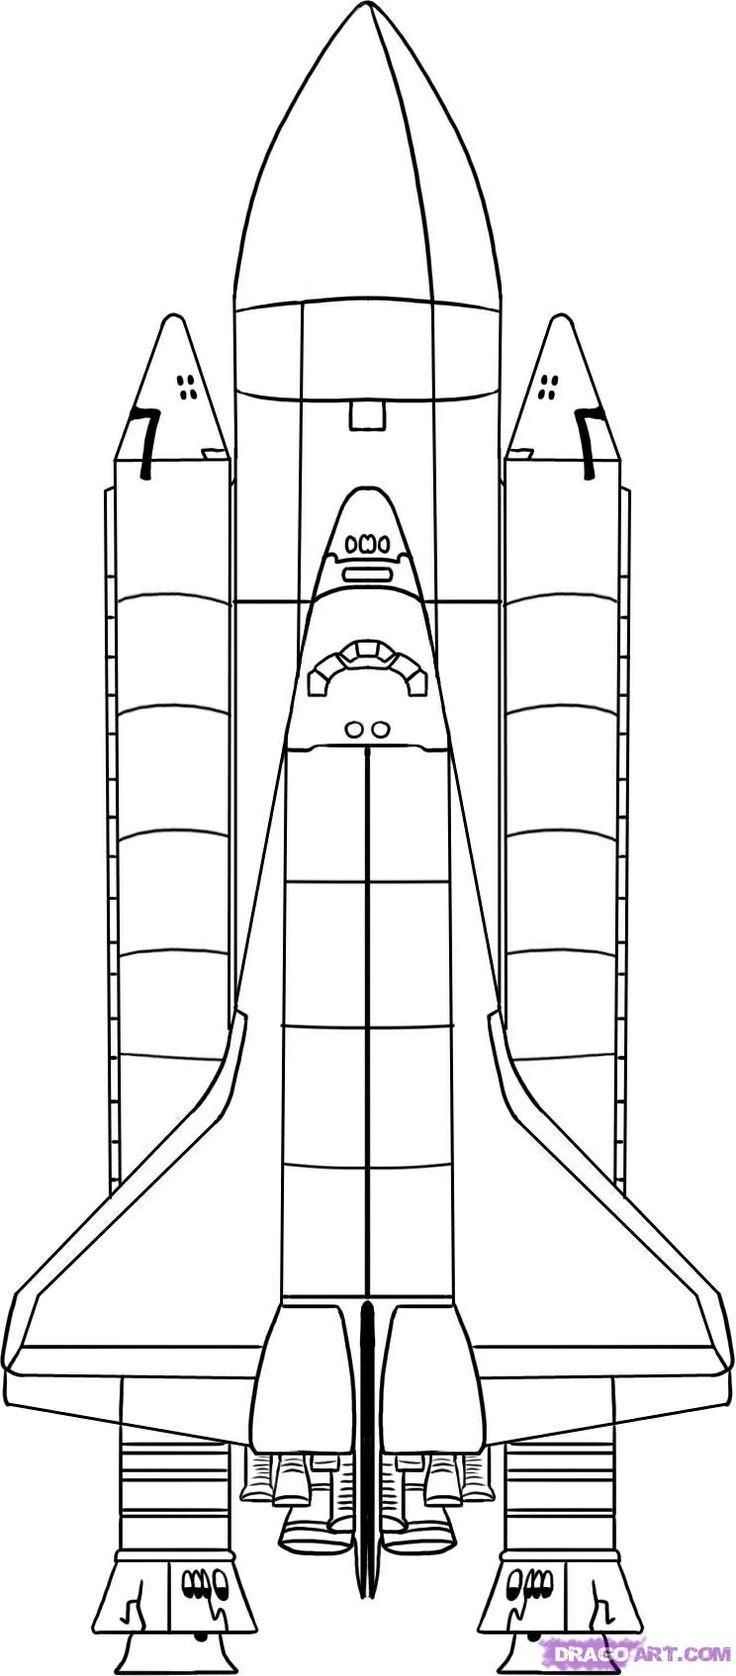 Spaceship Coloring Sheet #mkblueridge #MacKid #macaronikidblueridge